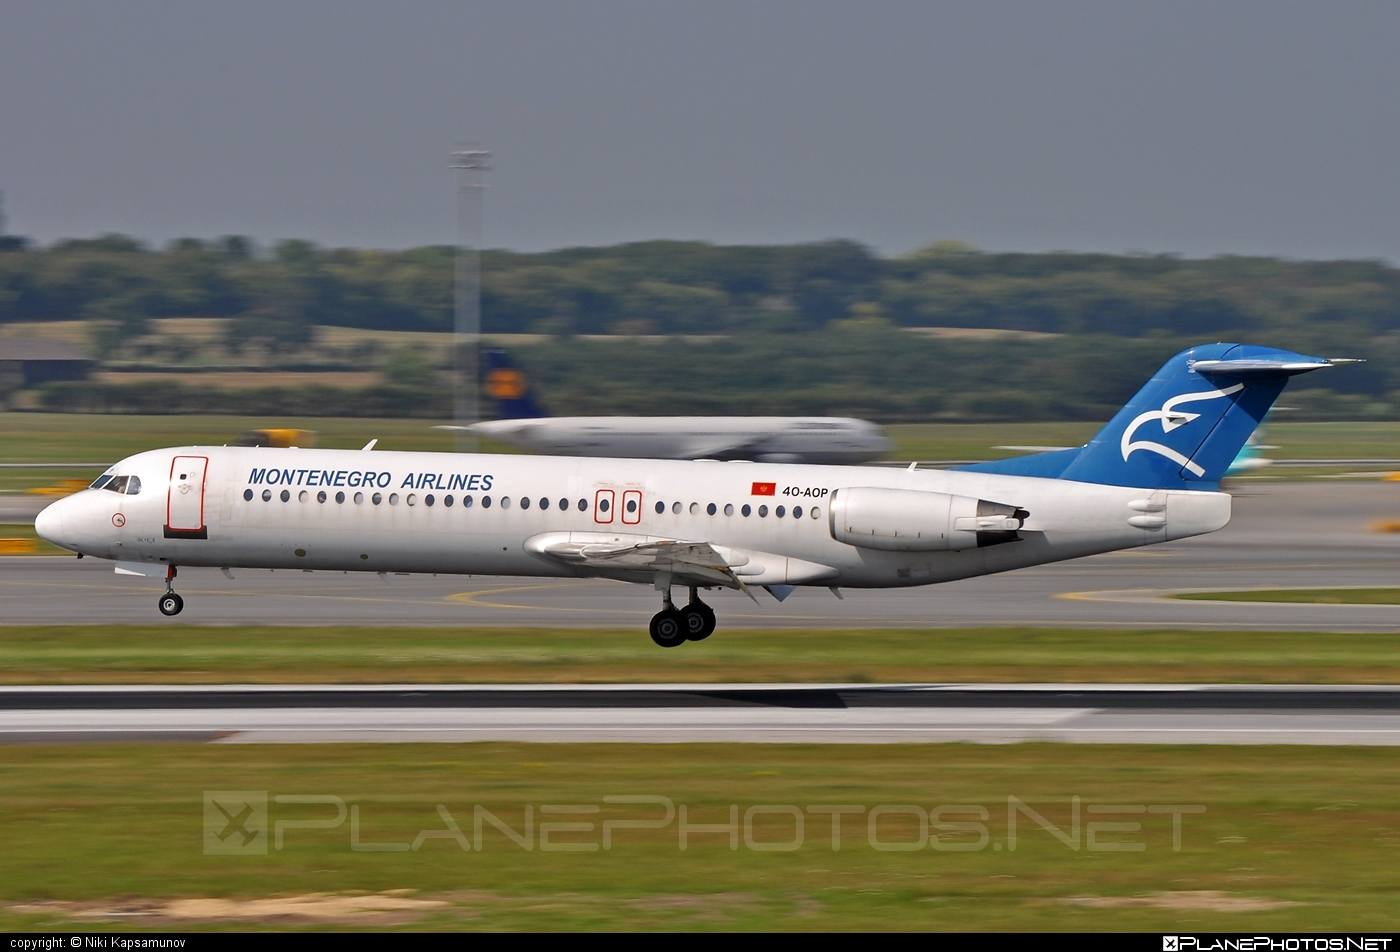 Fokker 100 - 4O-AOP operated by Montenegro Airlines #fokker #fokker100